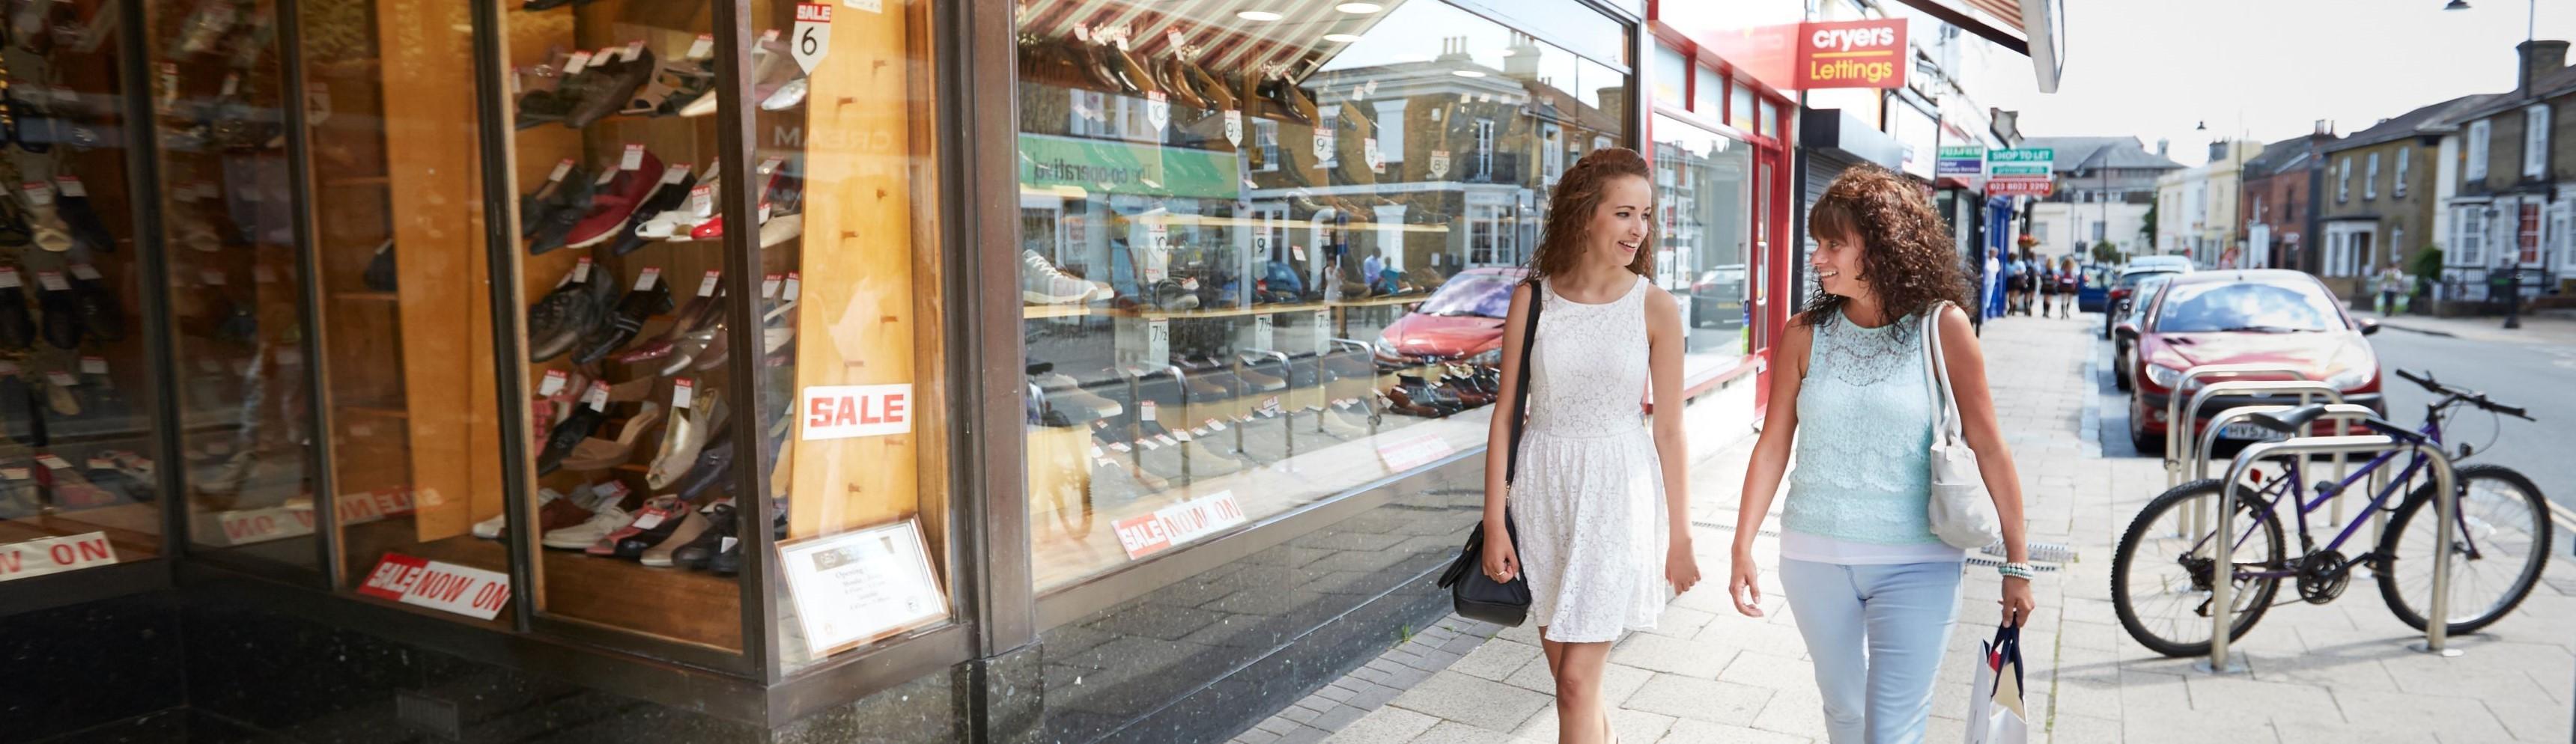 5 Unusual Specialist Shops in Southampton